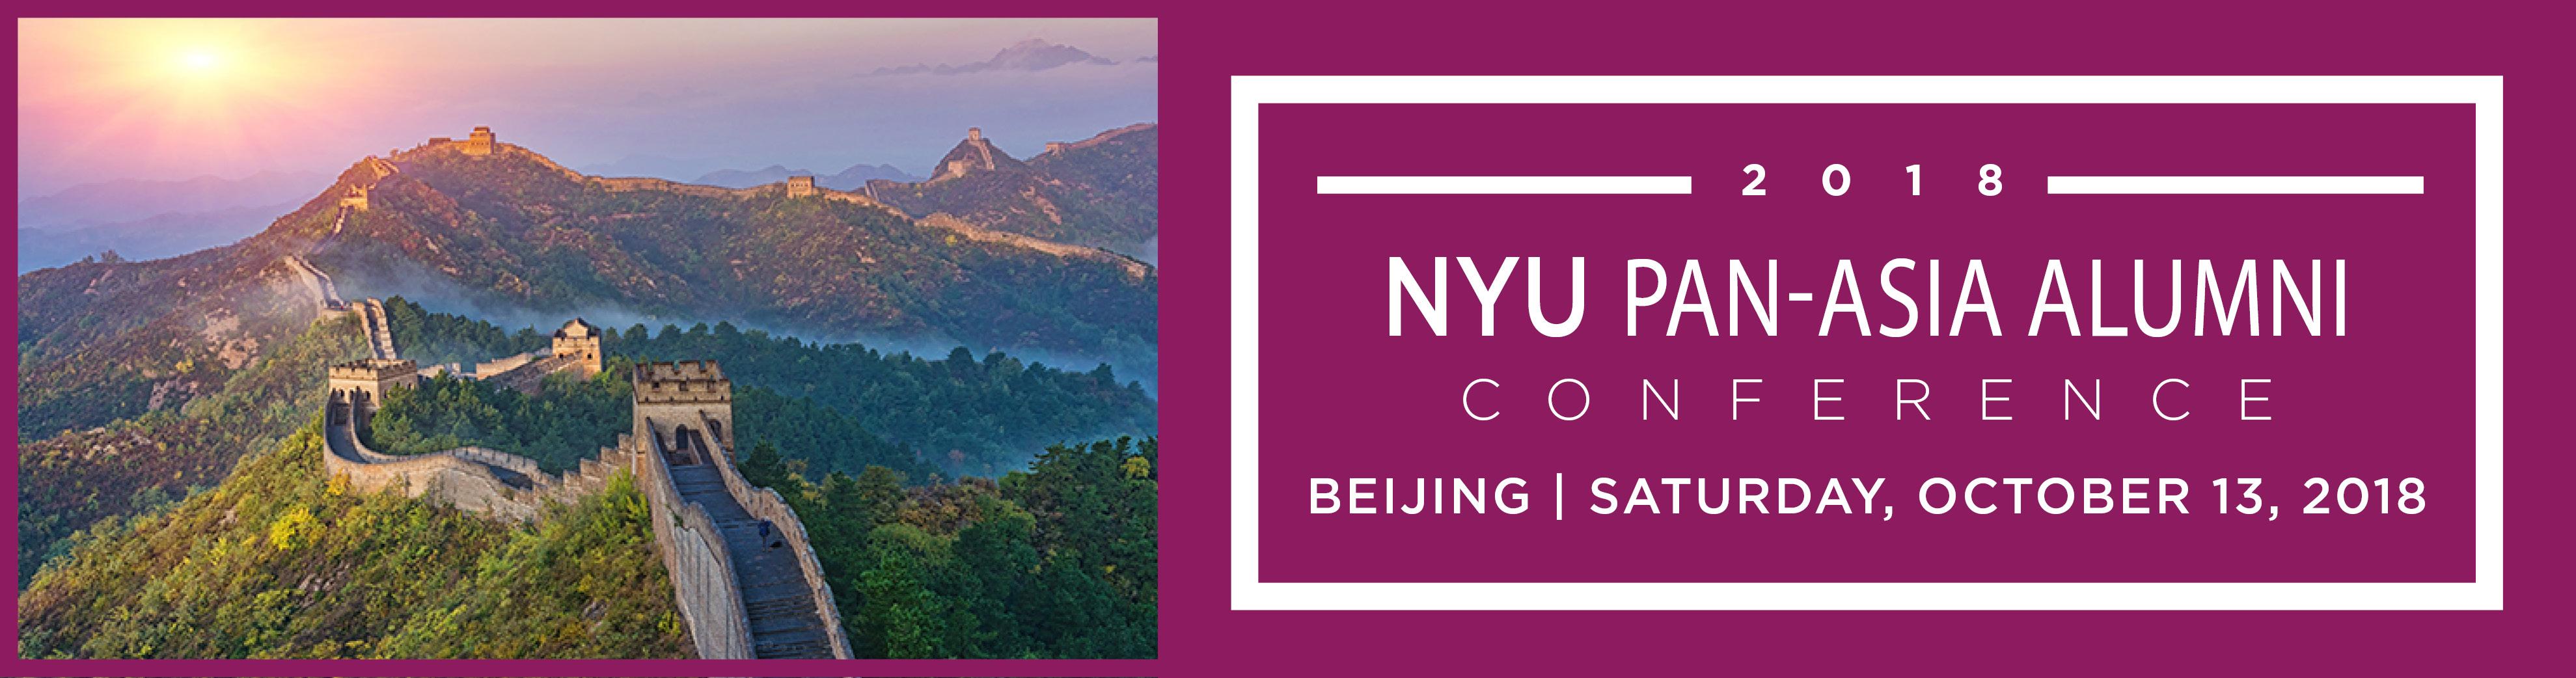 NYU Pan-Asia Alumni Conference 2018: Bridging the Future